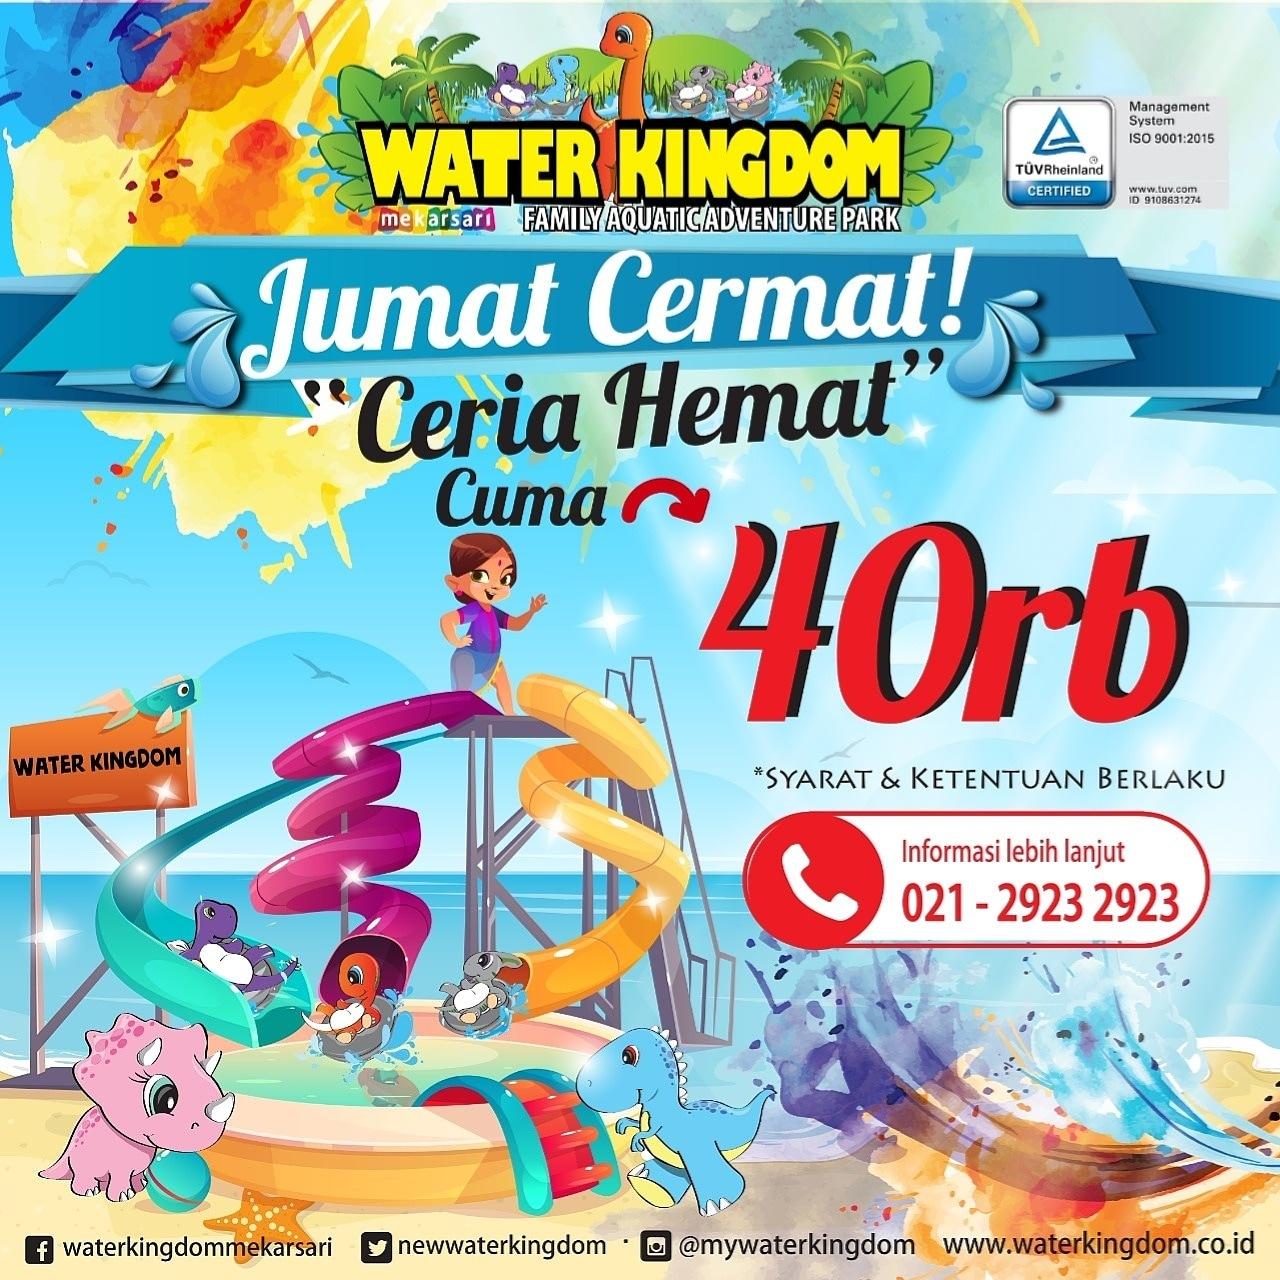 WATER KINGDOM HADIRKAN PROMO DI HARI JUMAT